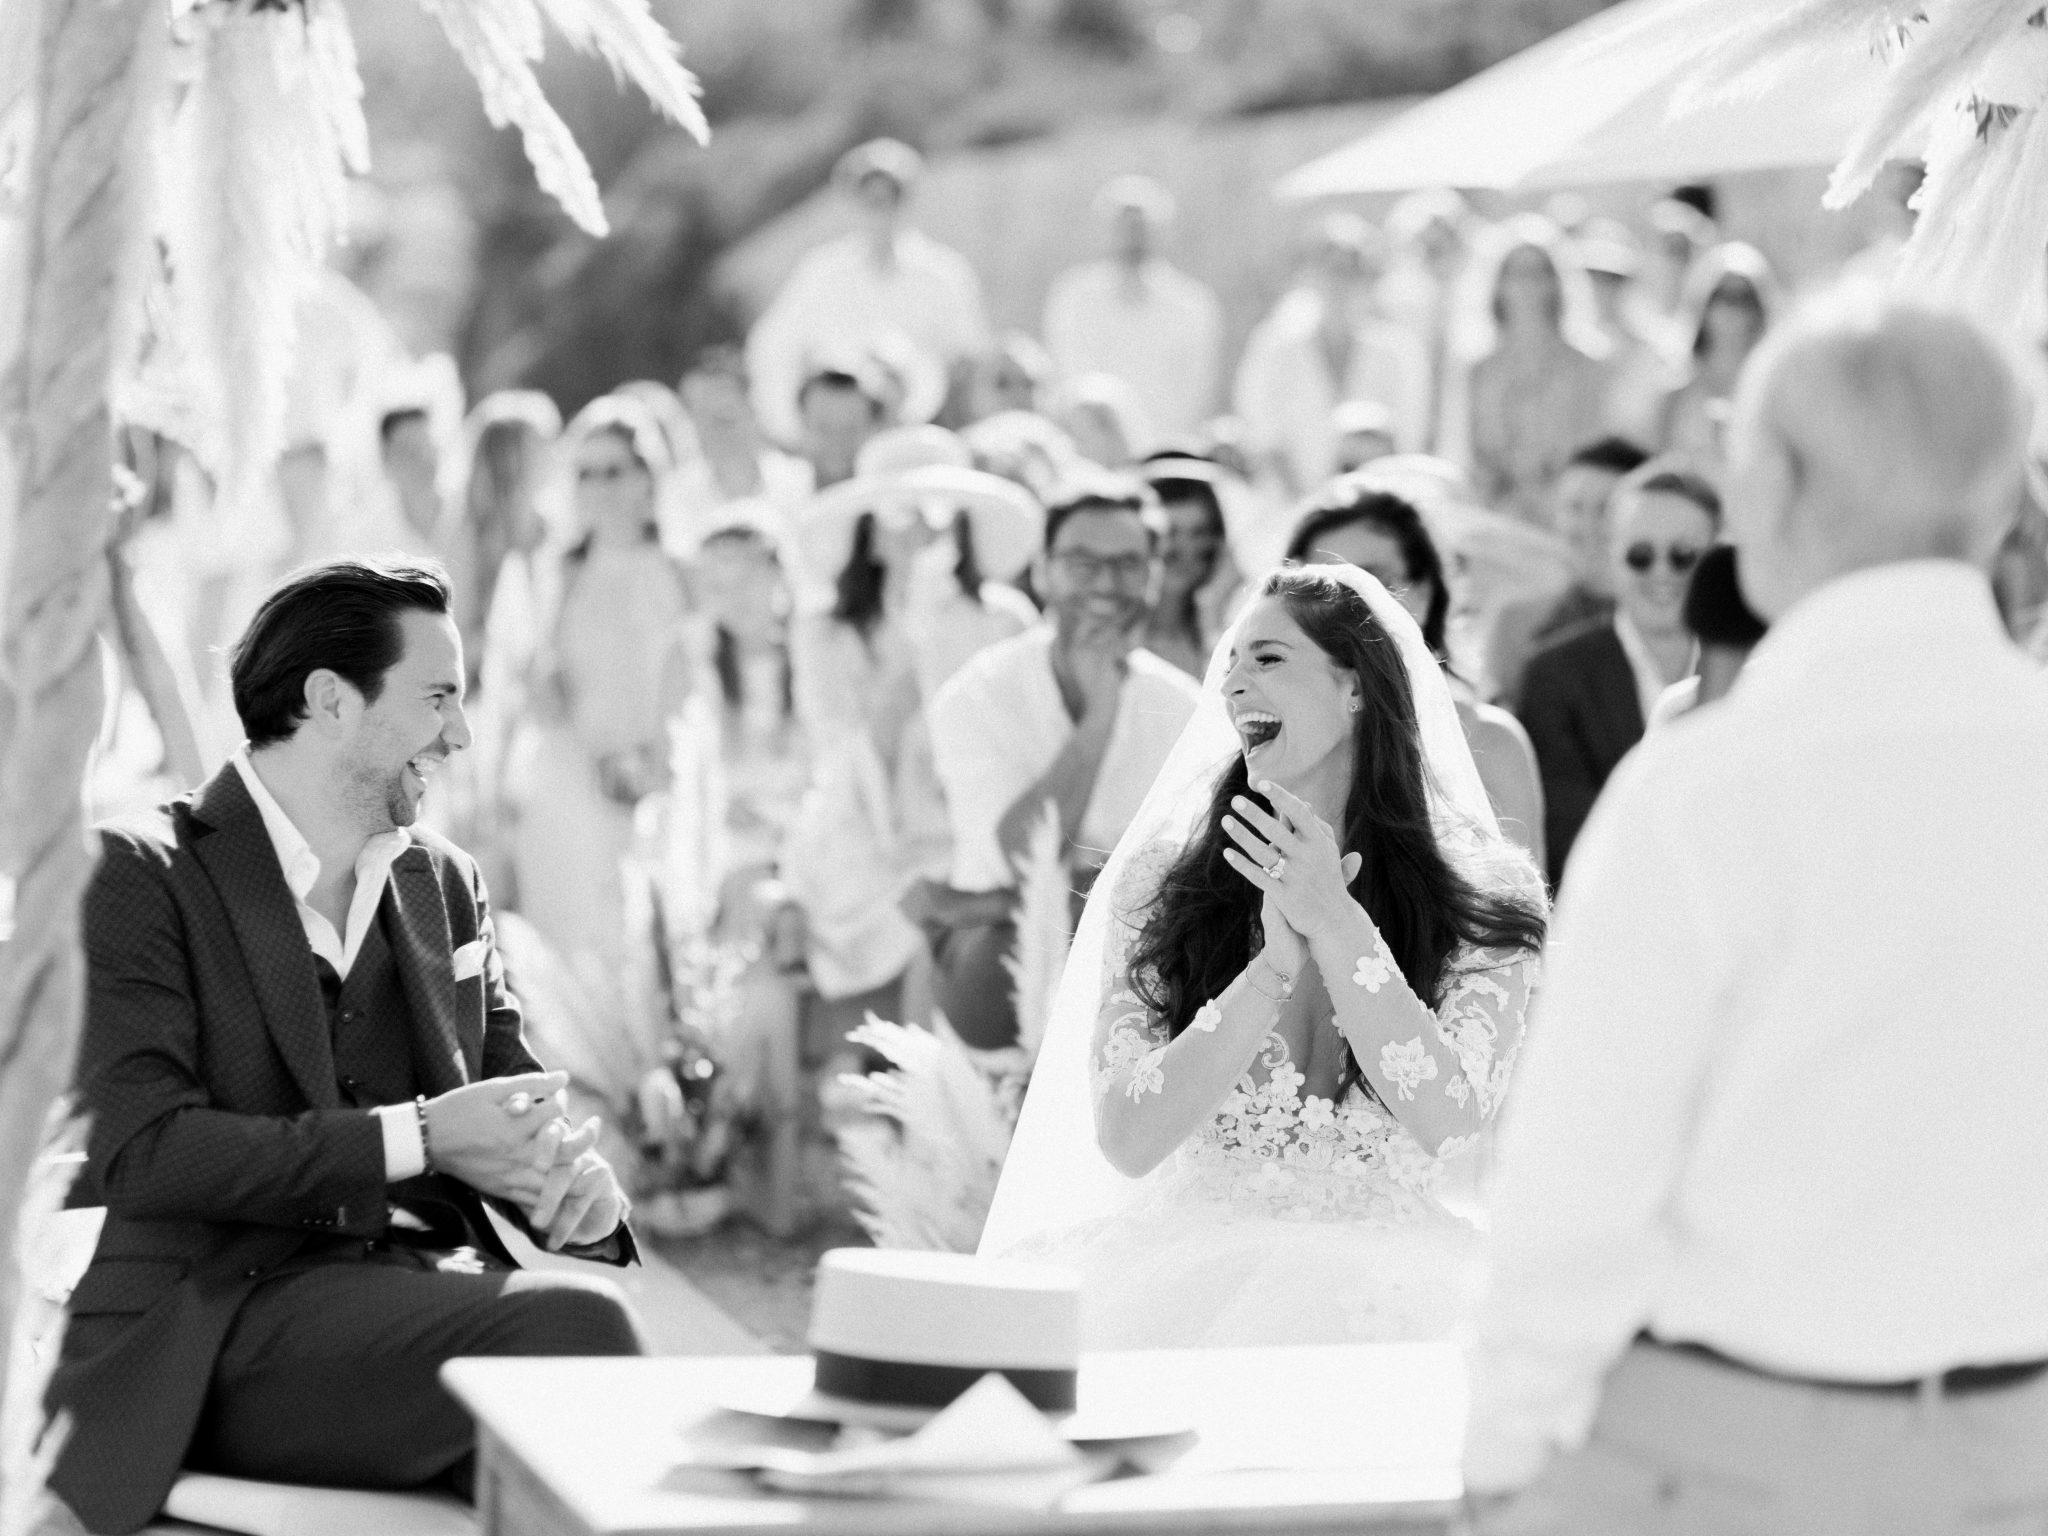 La Escollera, Wedding Photographer, Youri Claessens Photography